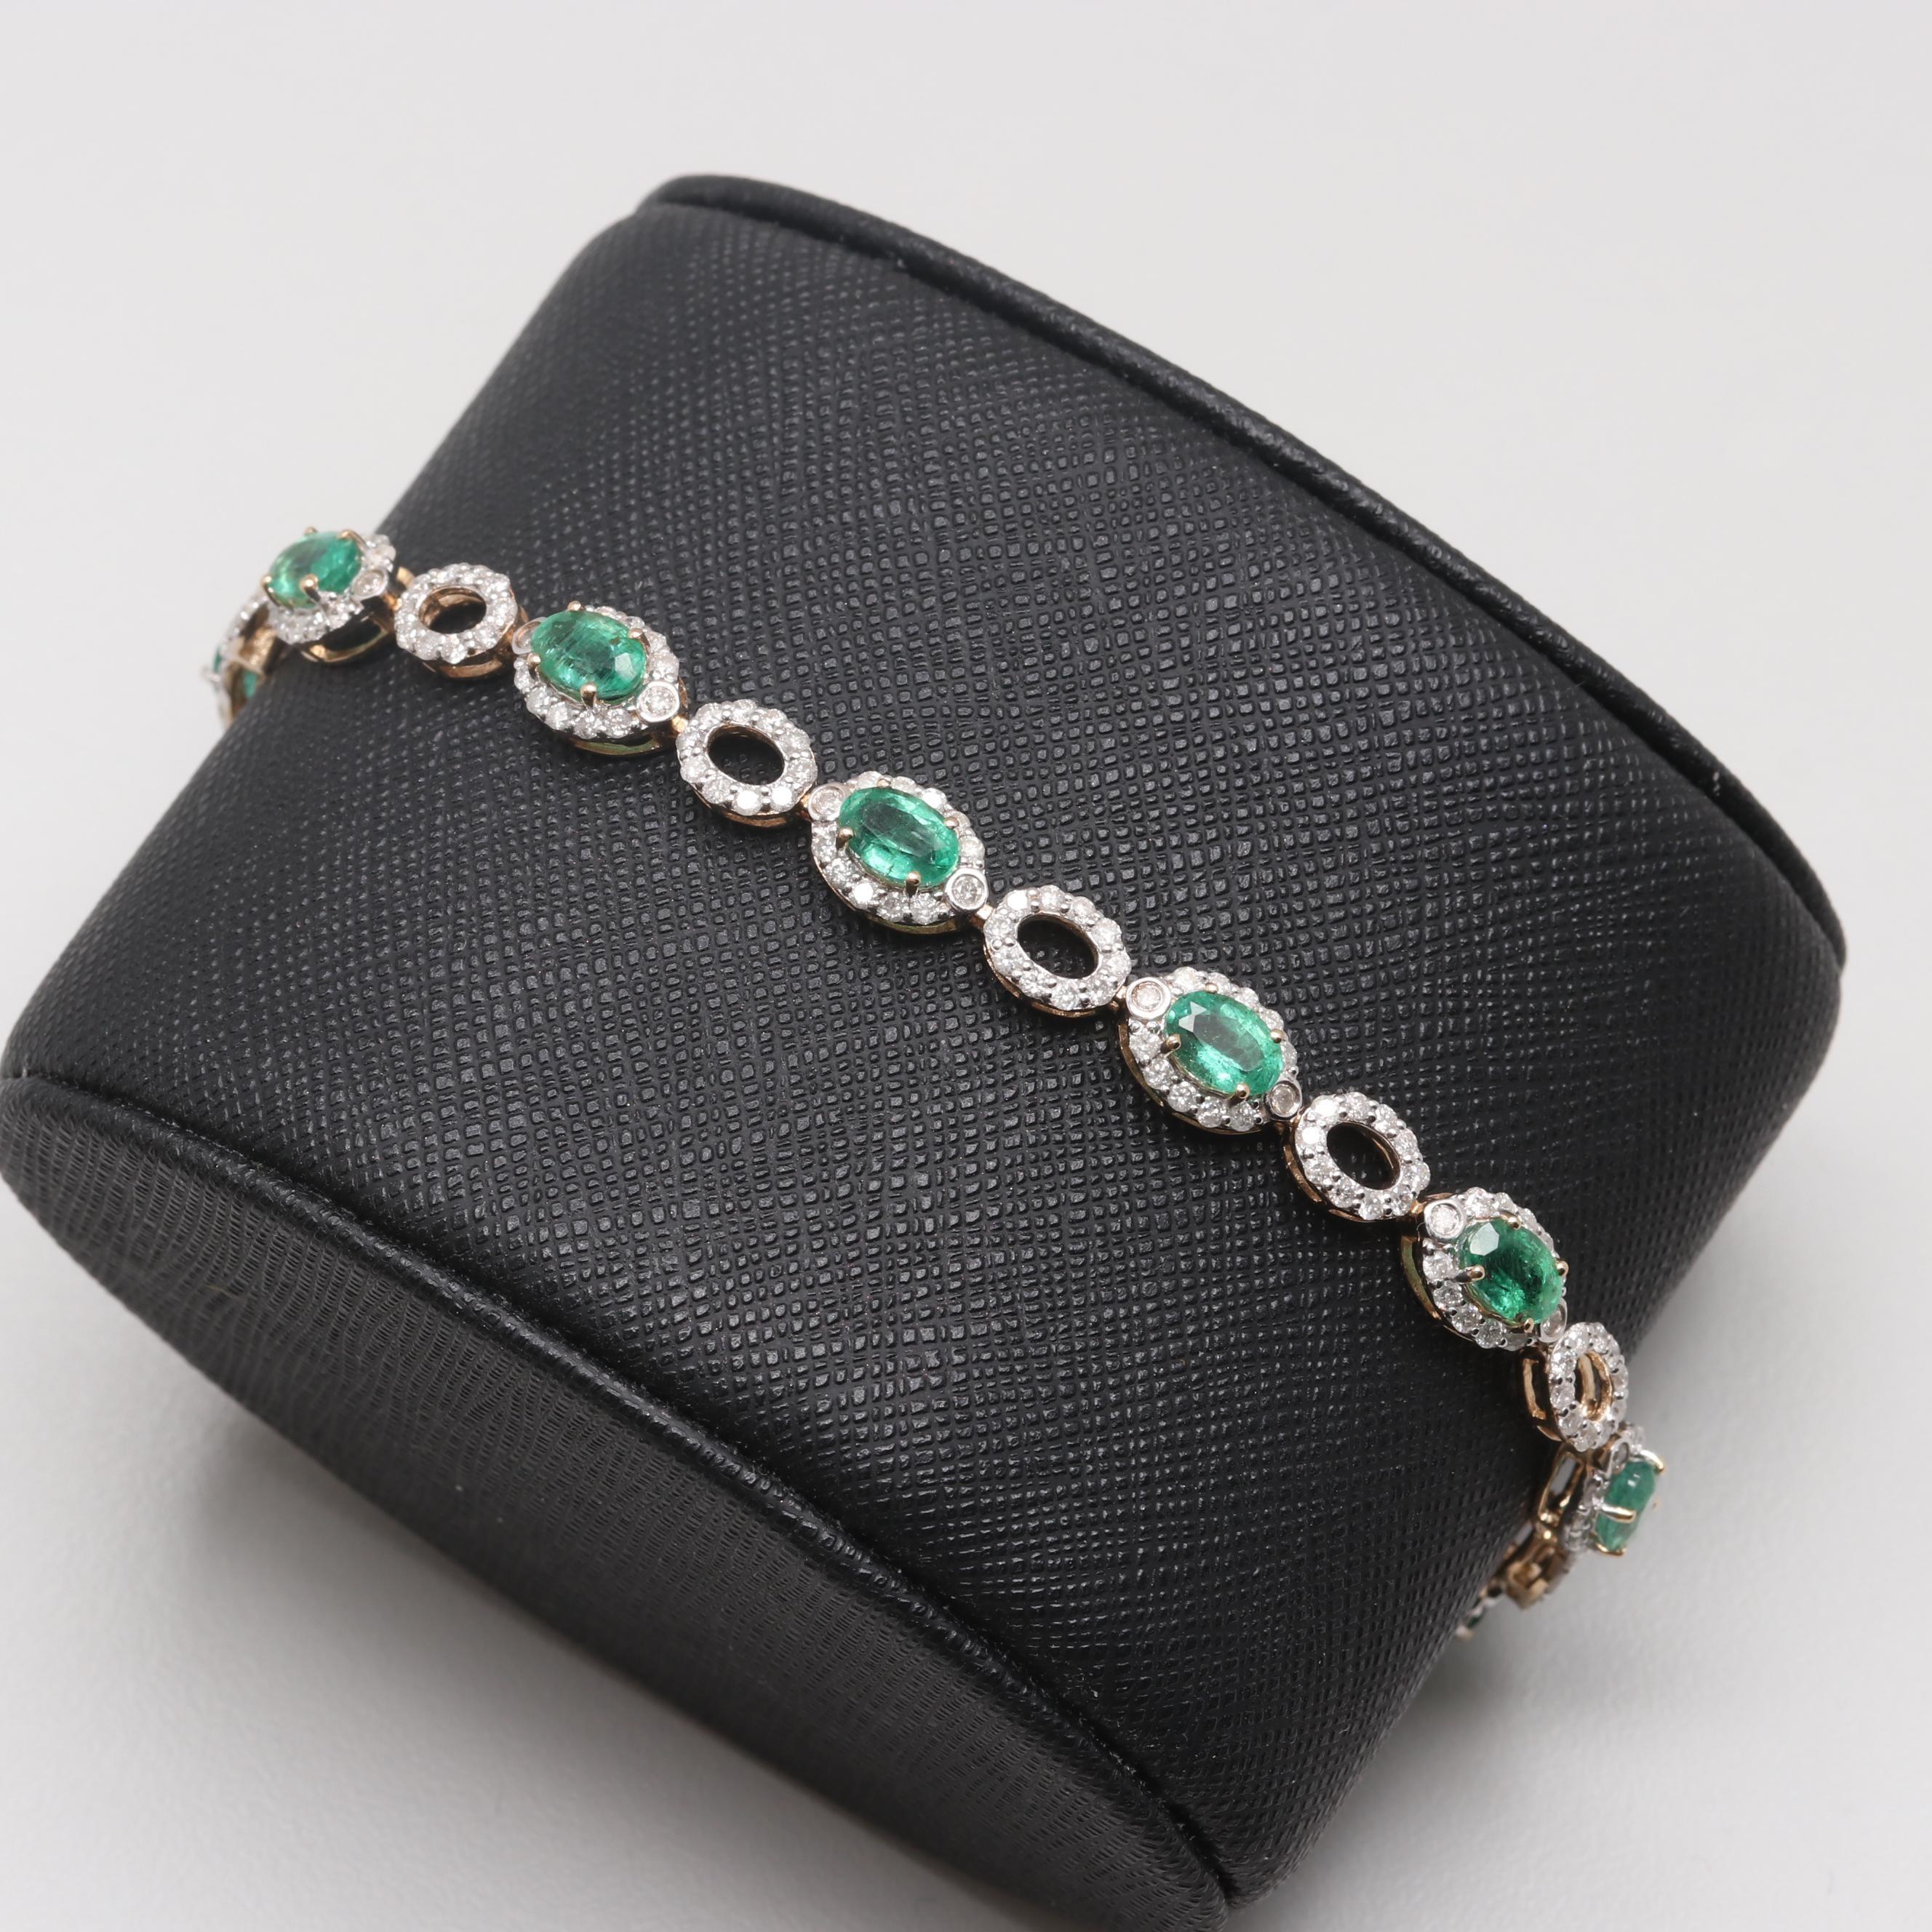 14K Yellow Gold Emerald and 2.75 CTW Diamond Bracelet